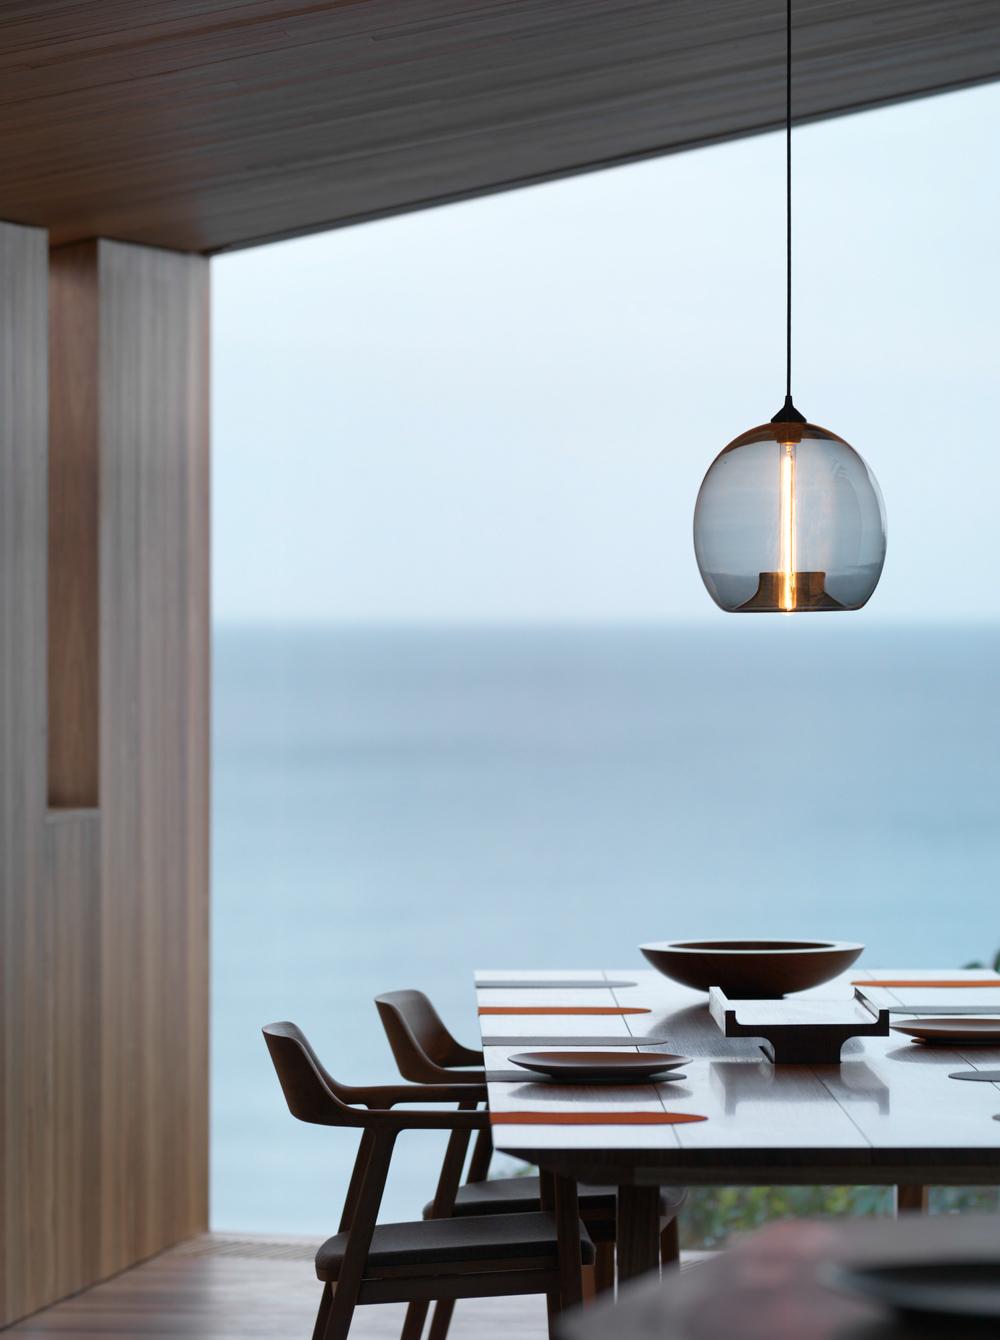 fairhaven-beach-house-john-wardle-architects-the-design-emotive-03.jpg